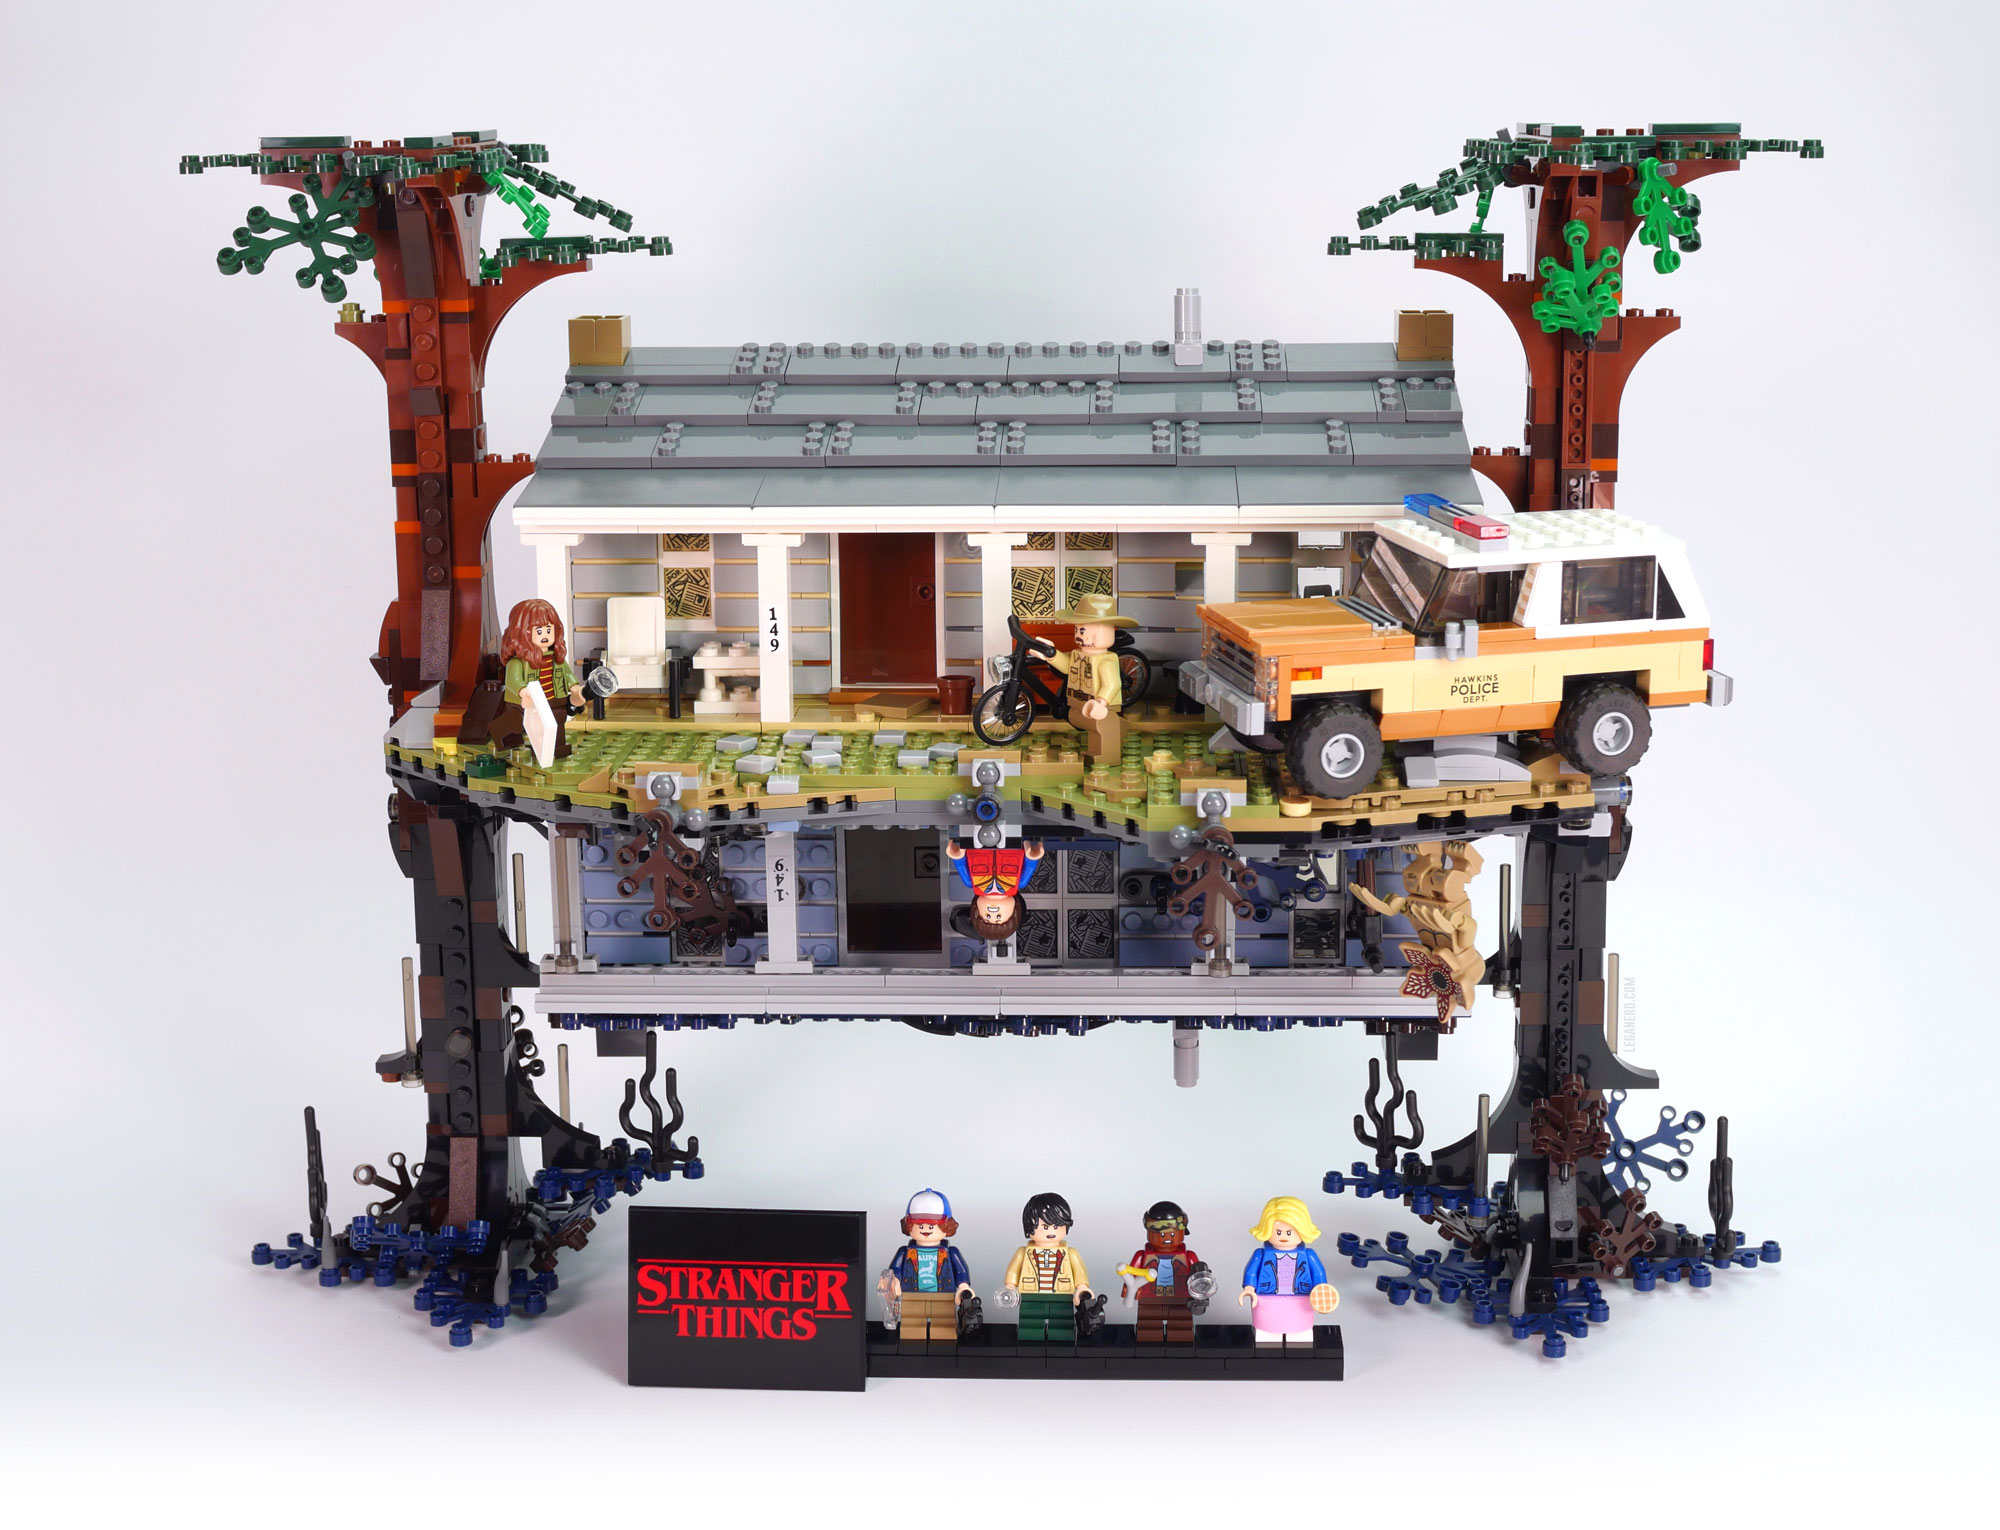 Lego Stranger Things: The Upside Down